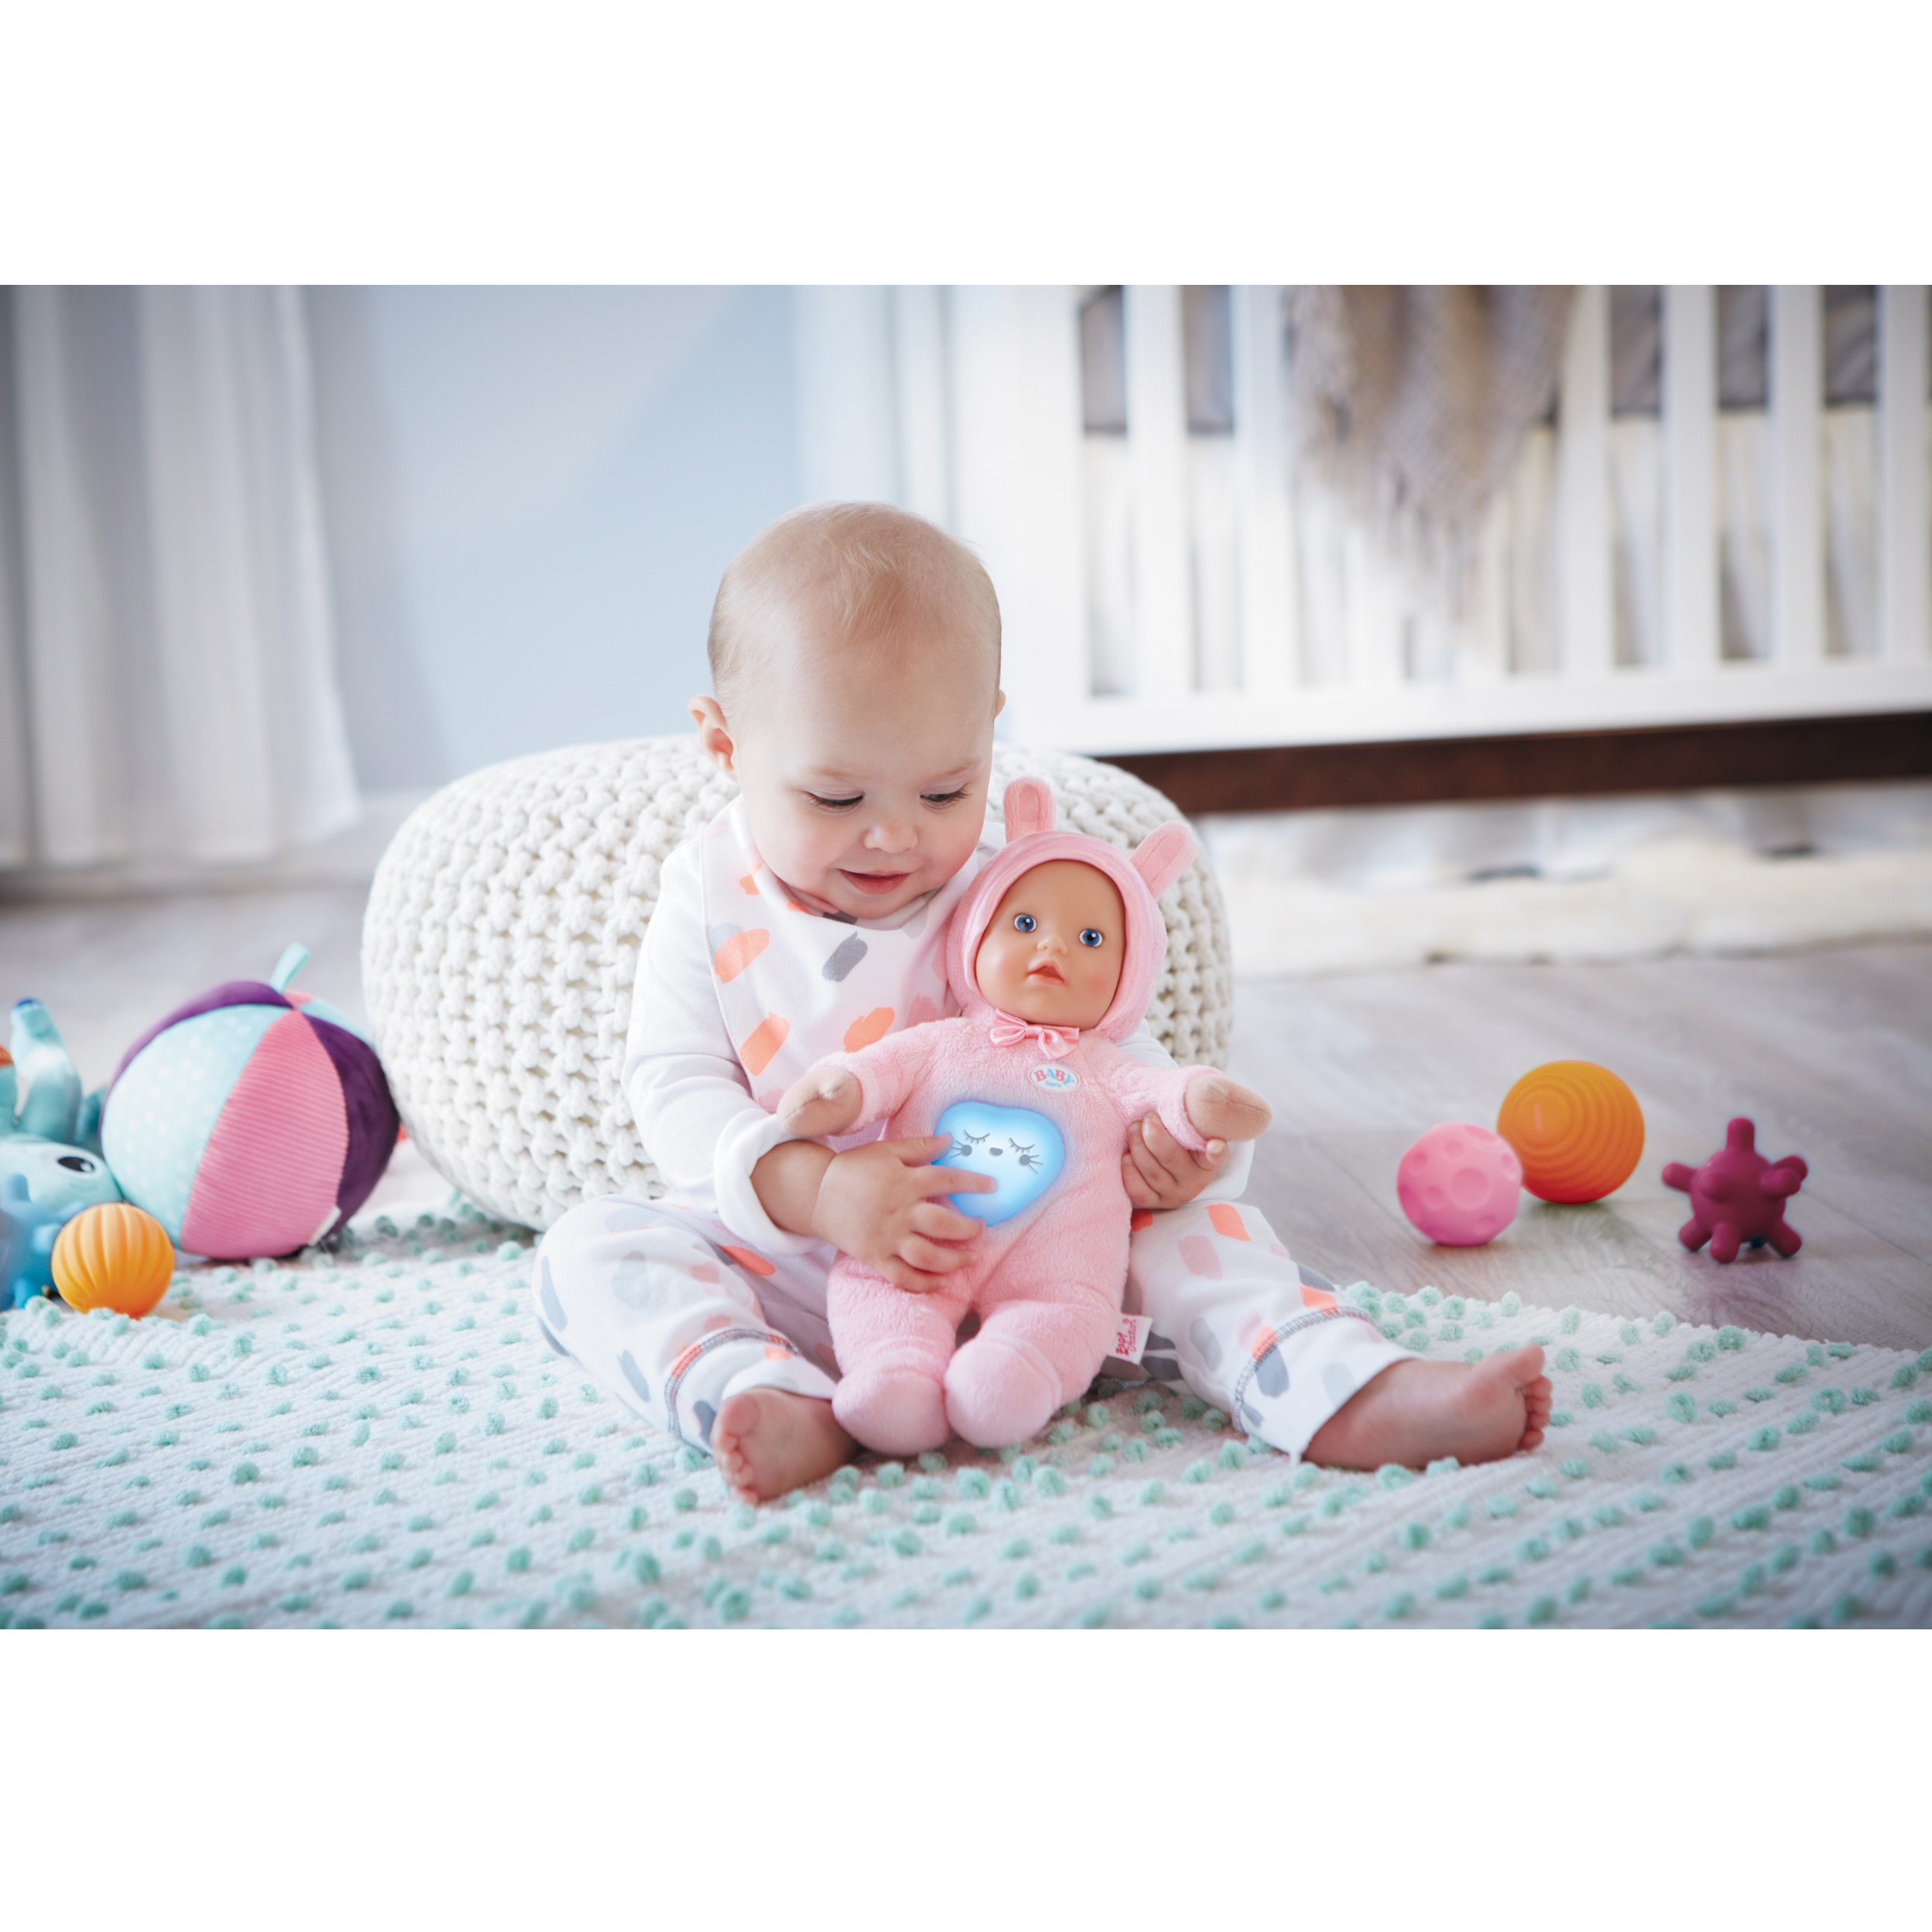 Good Night Pics Cute Baby Best Hd Wallpaper